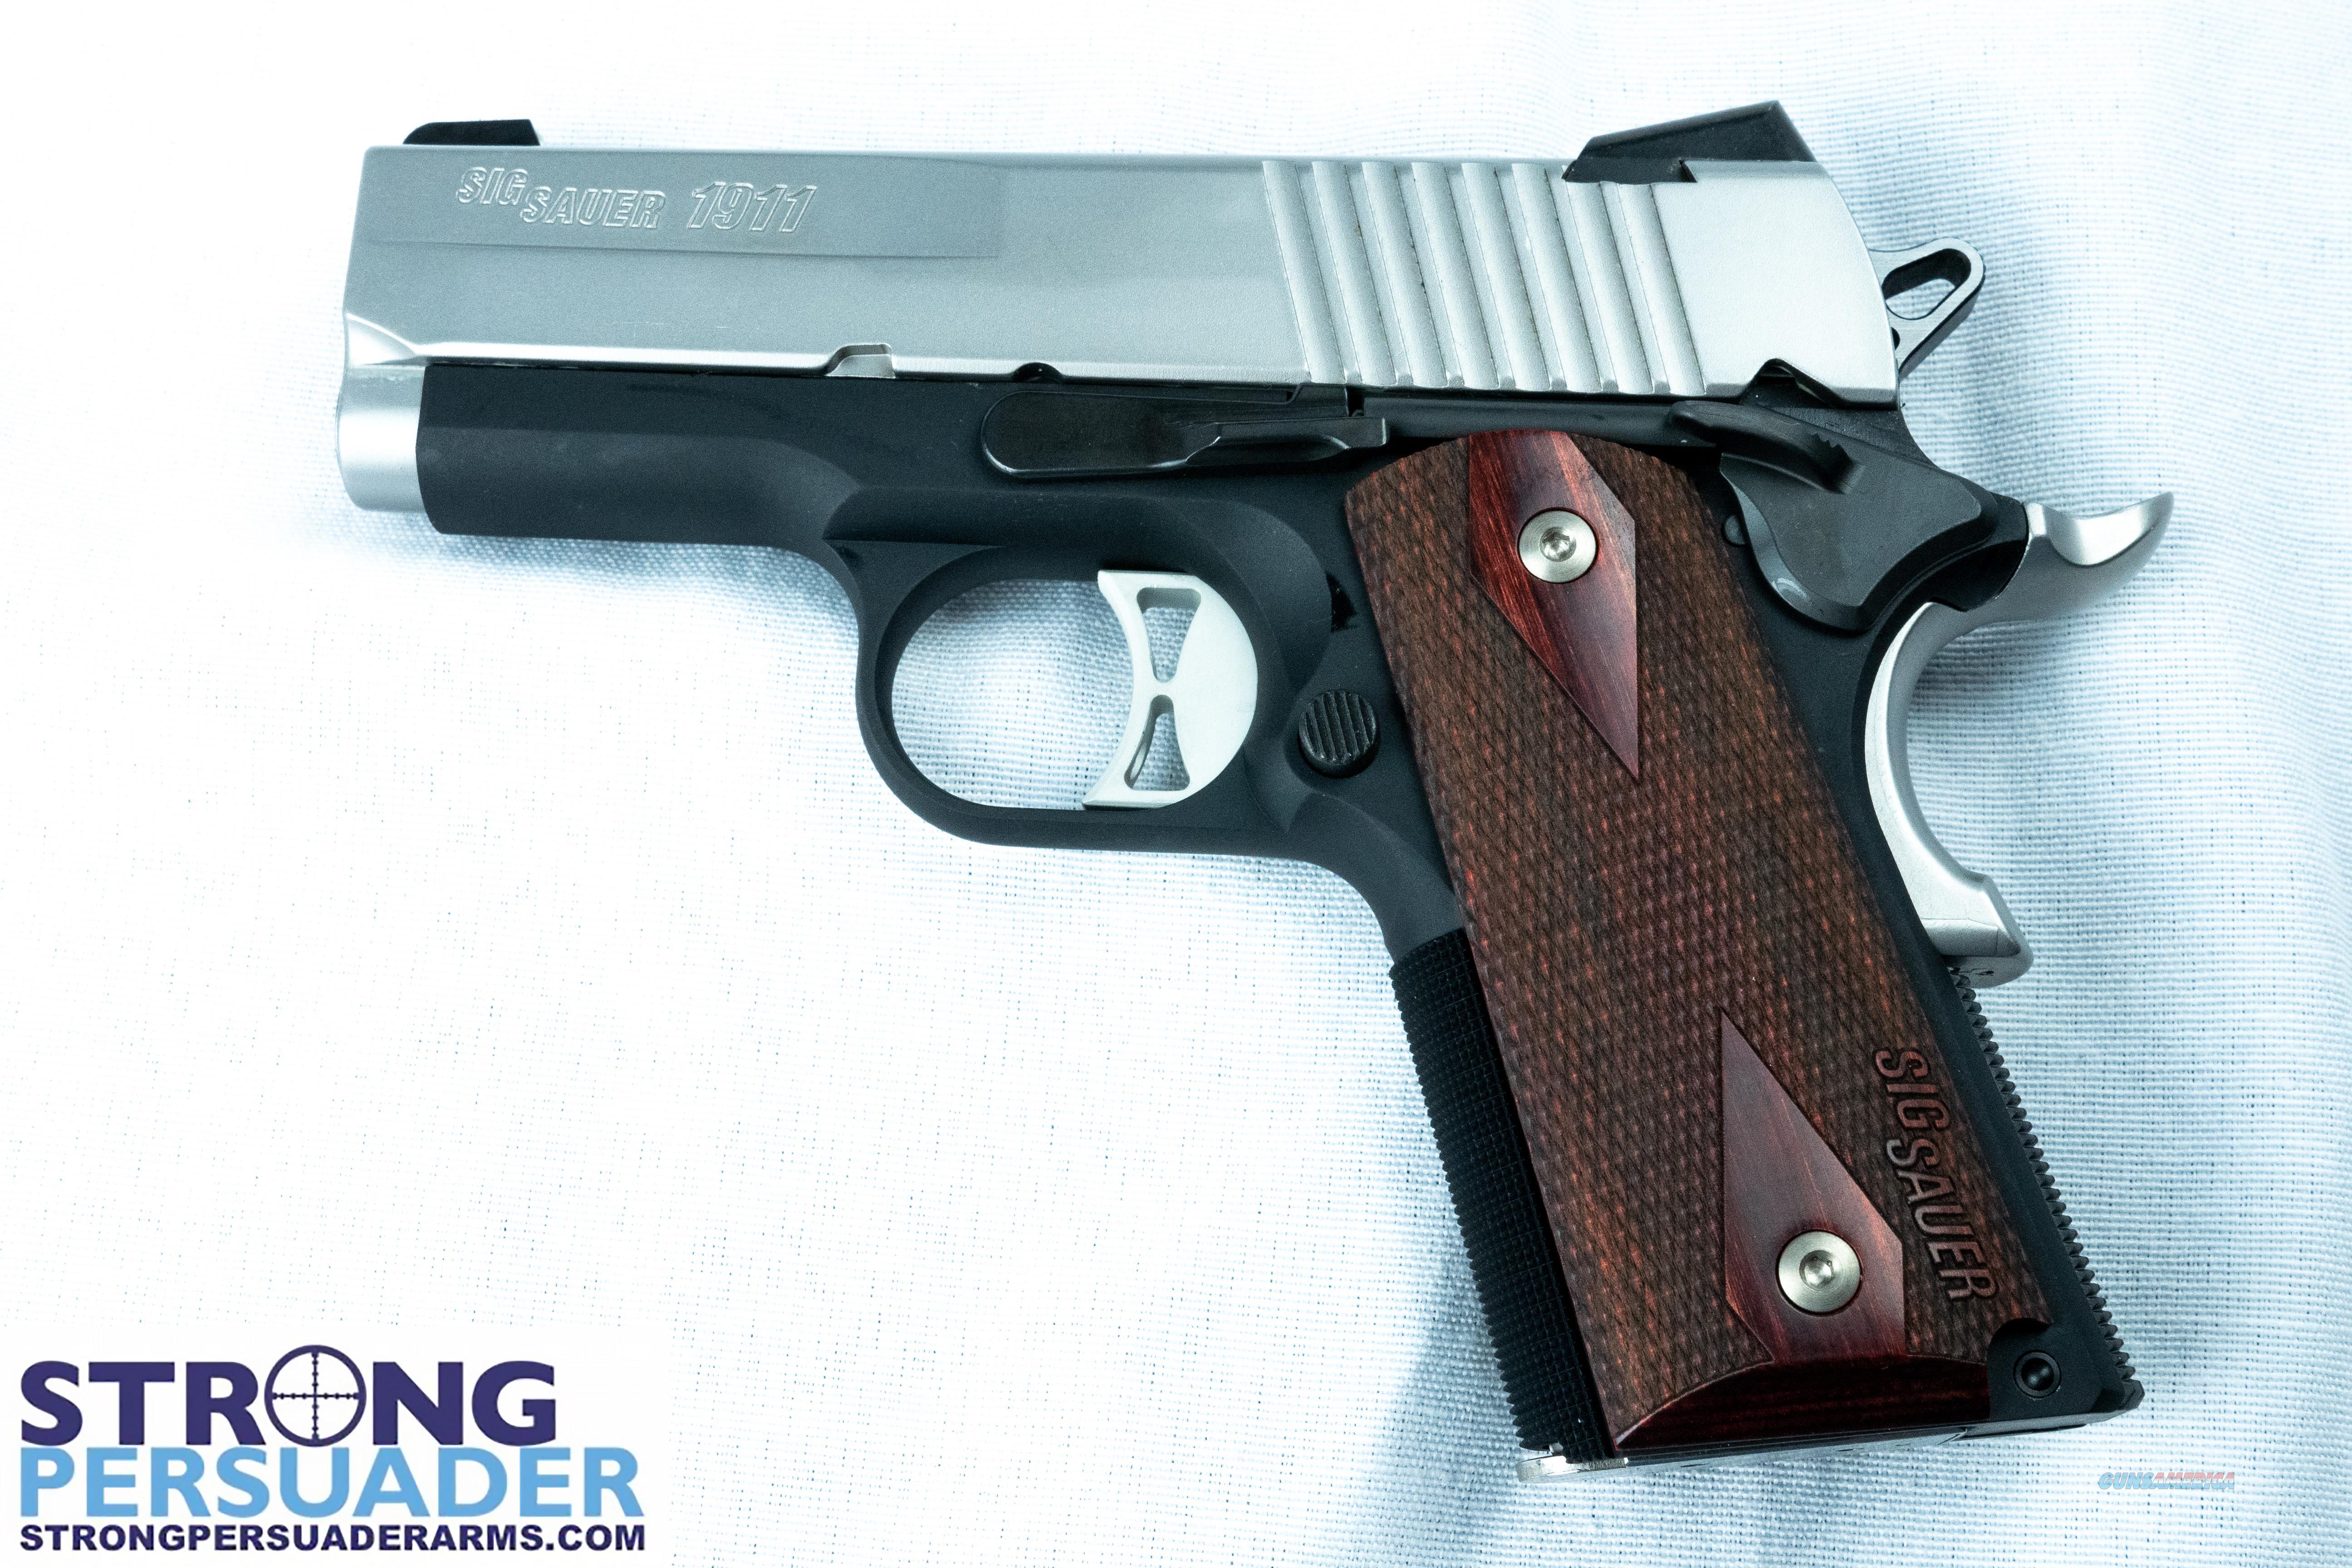 Sig Sauer 1911 Ultra Two-Tone (1911U-45-TSS)  Guns > Pistols > Sig - Sauer/Sigarms Pistols > 1911